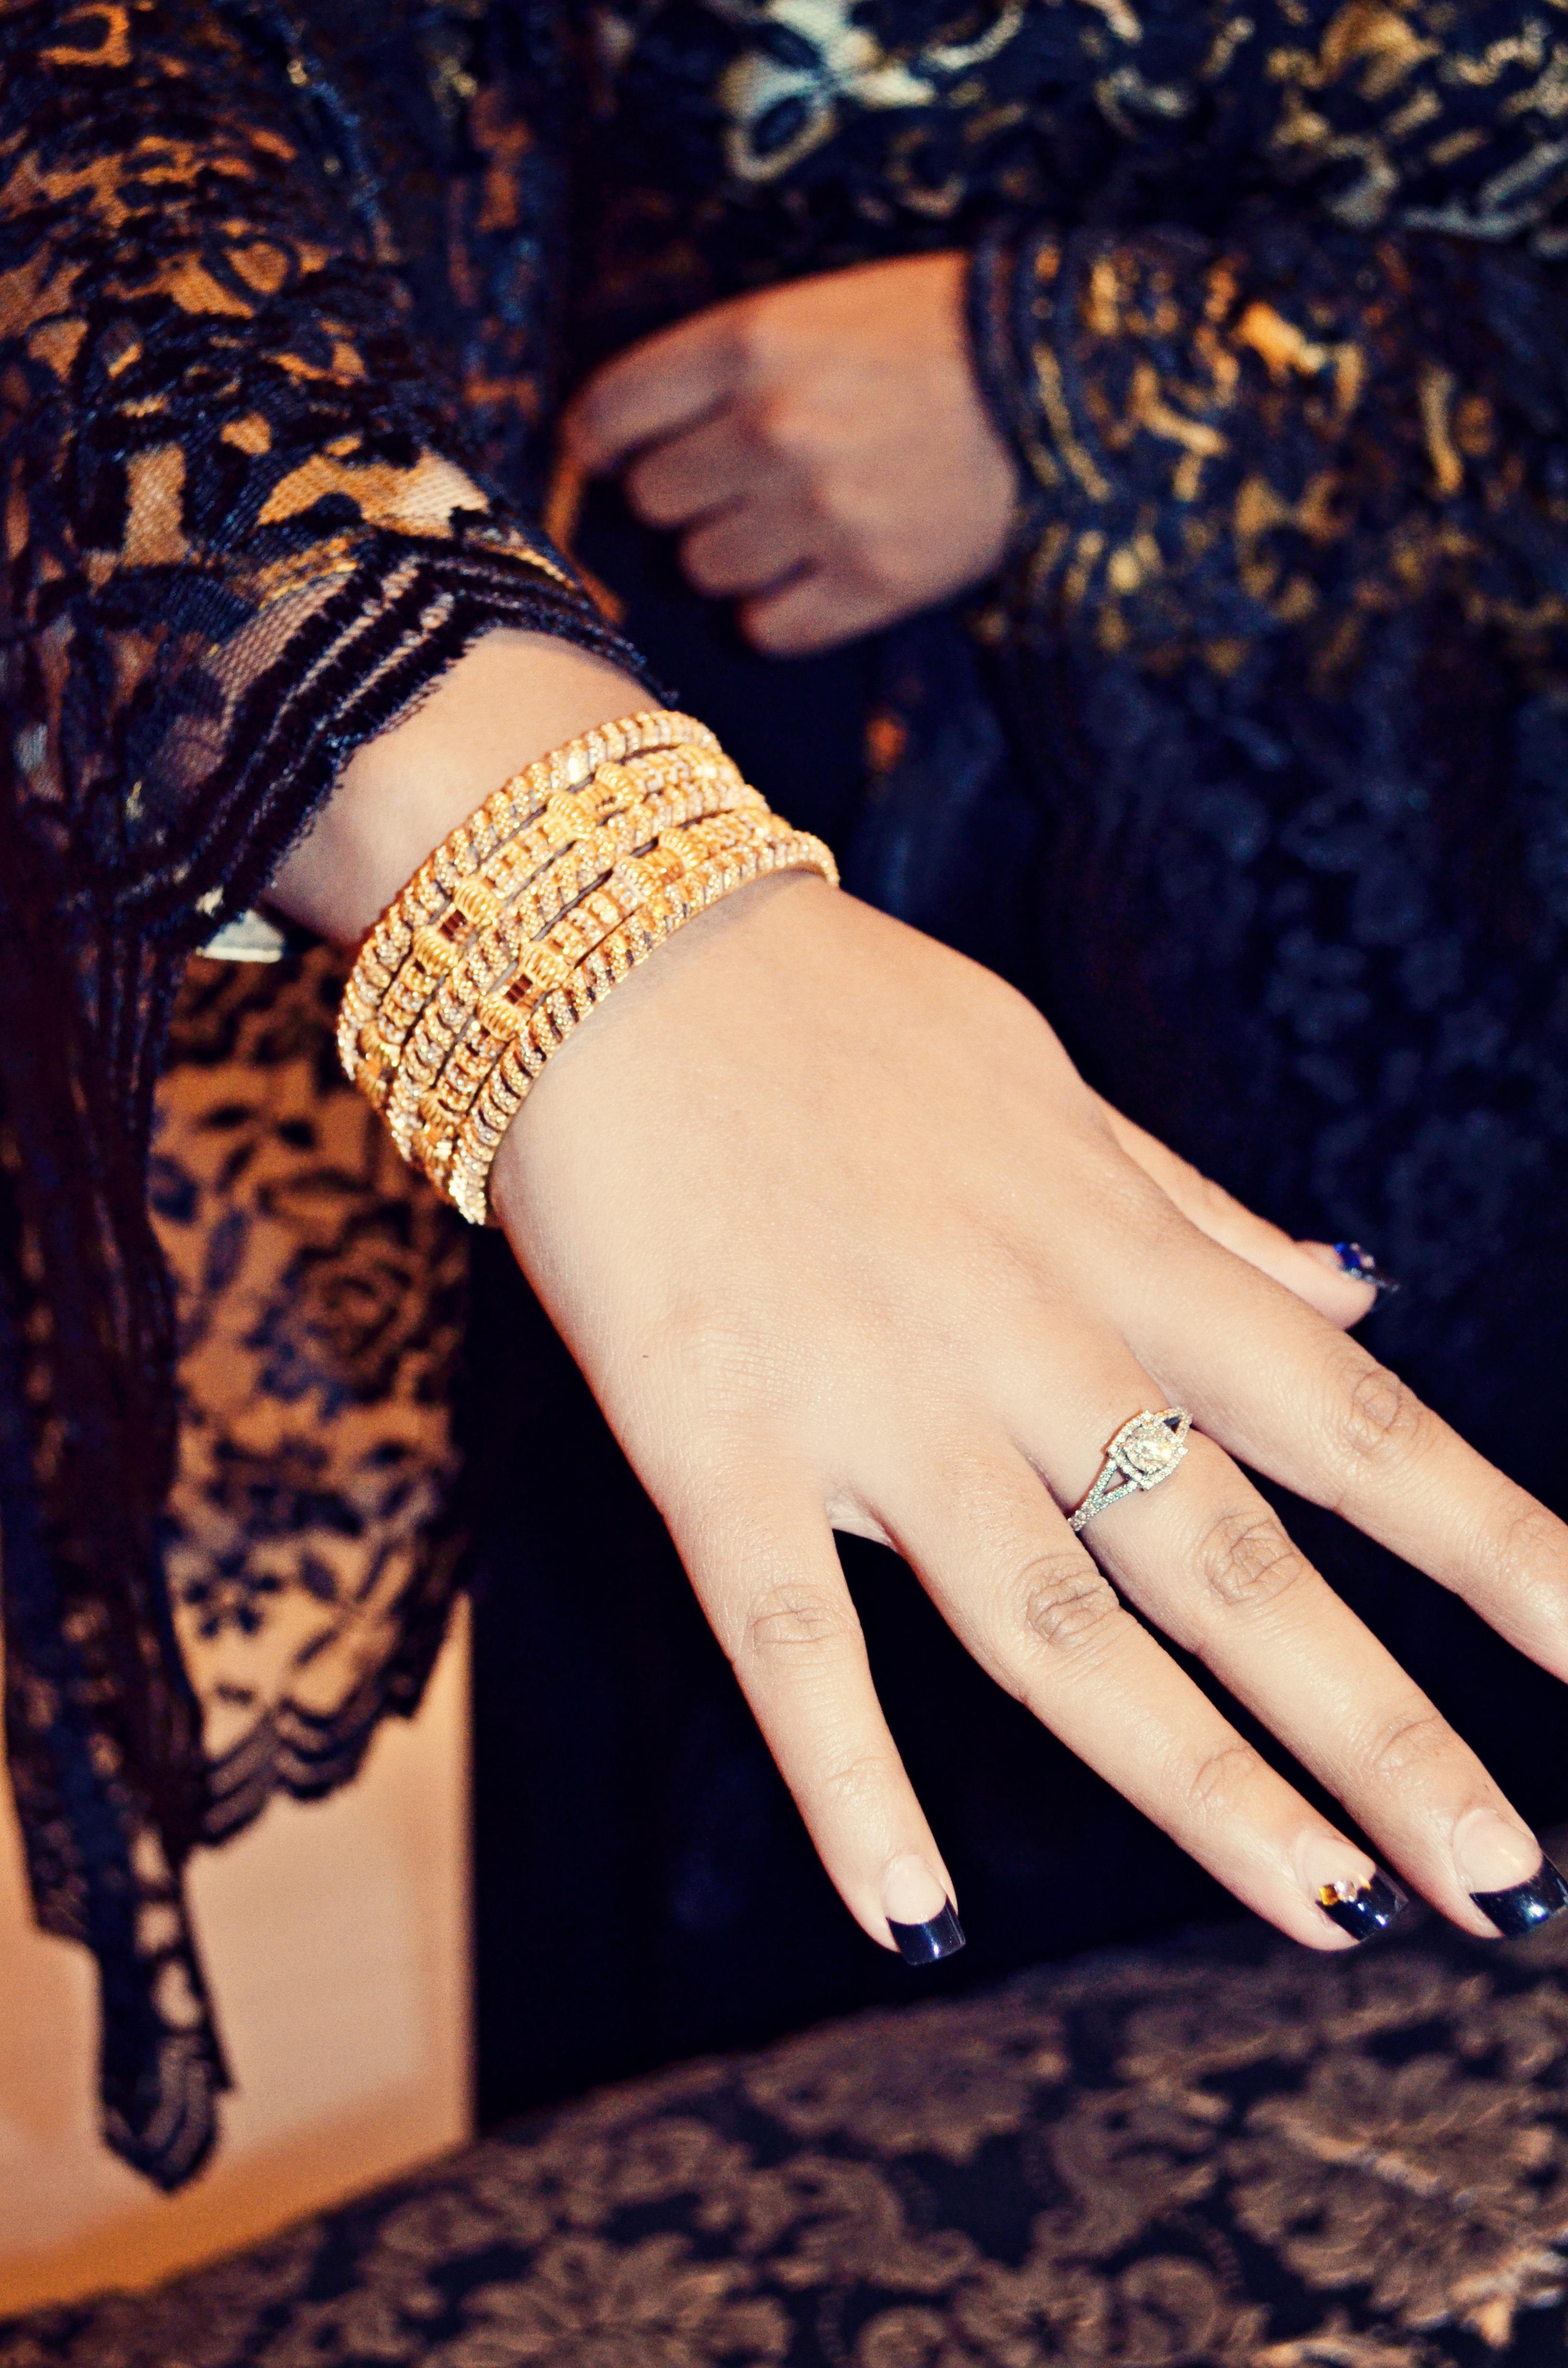 Gambar Tangan Cincin Pola Jari Lengan Pengantin Perhiasan